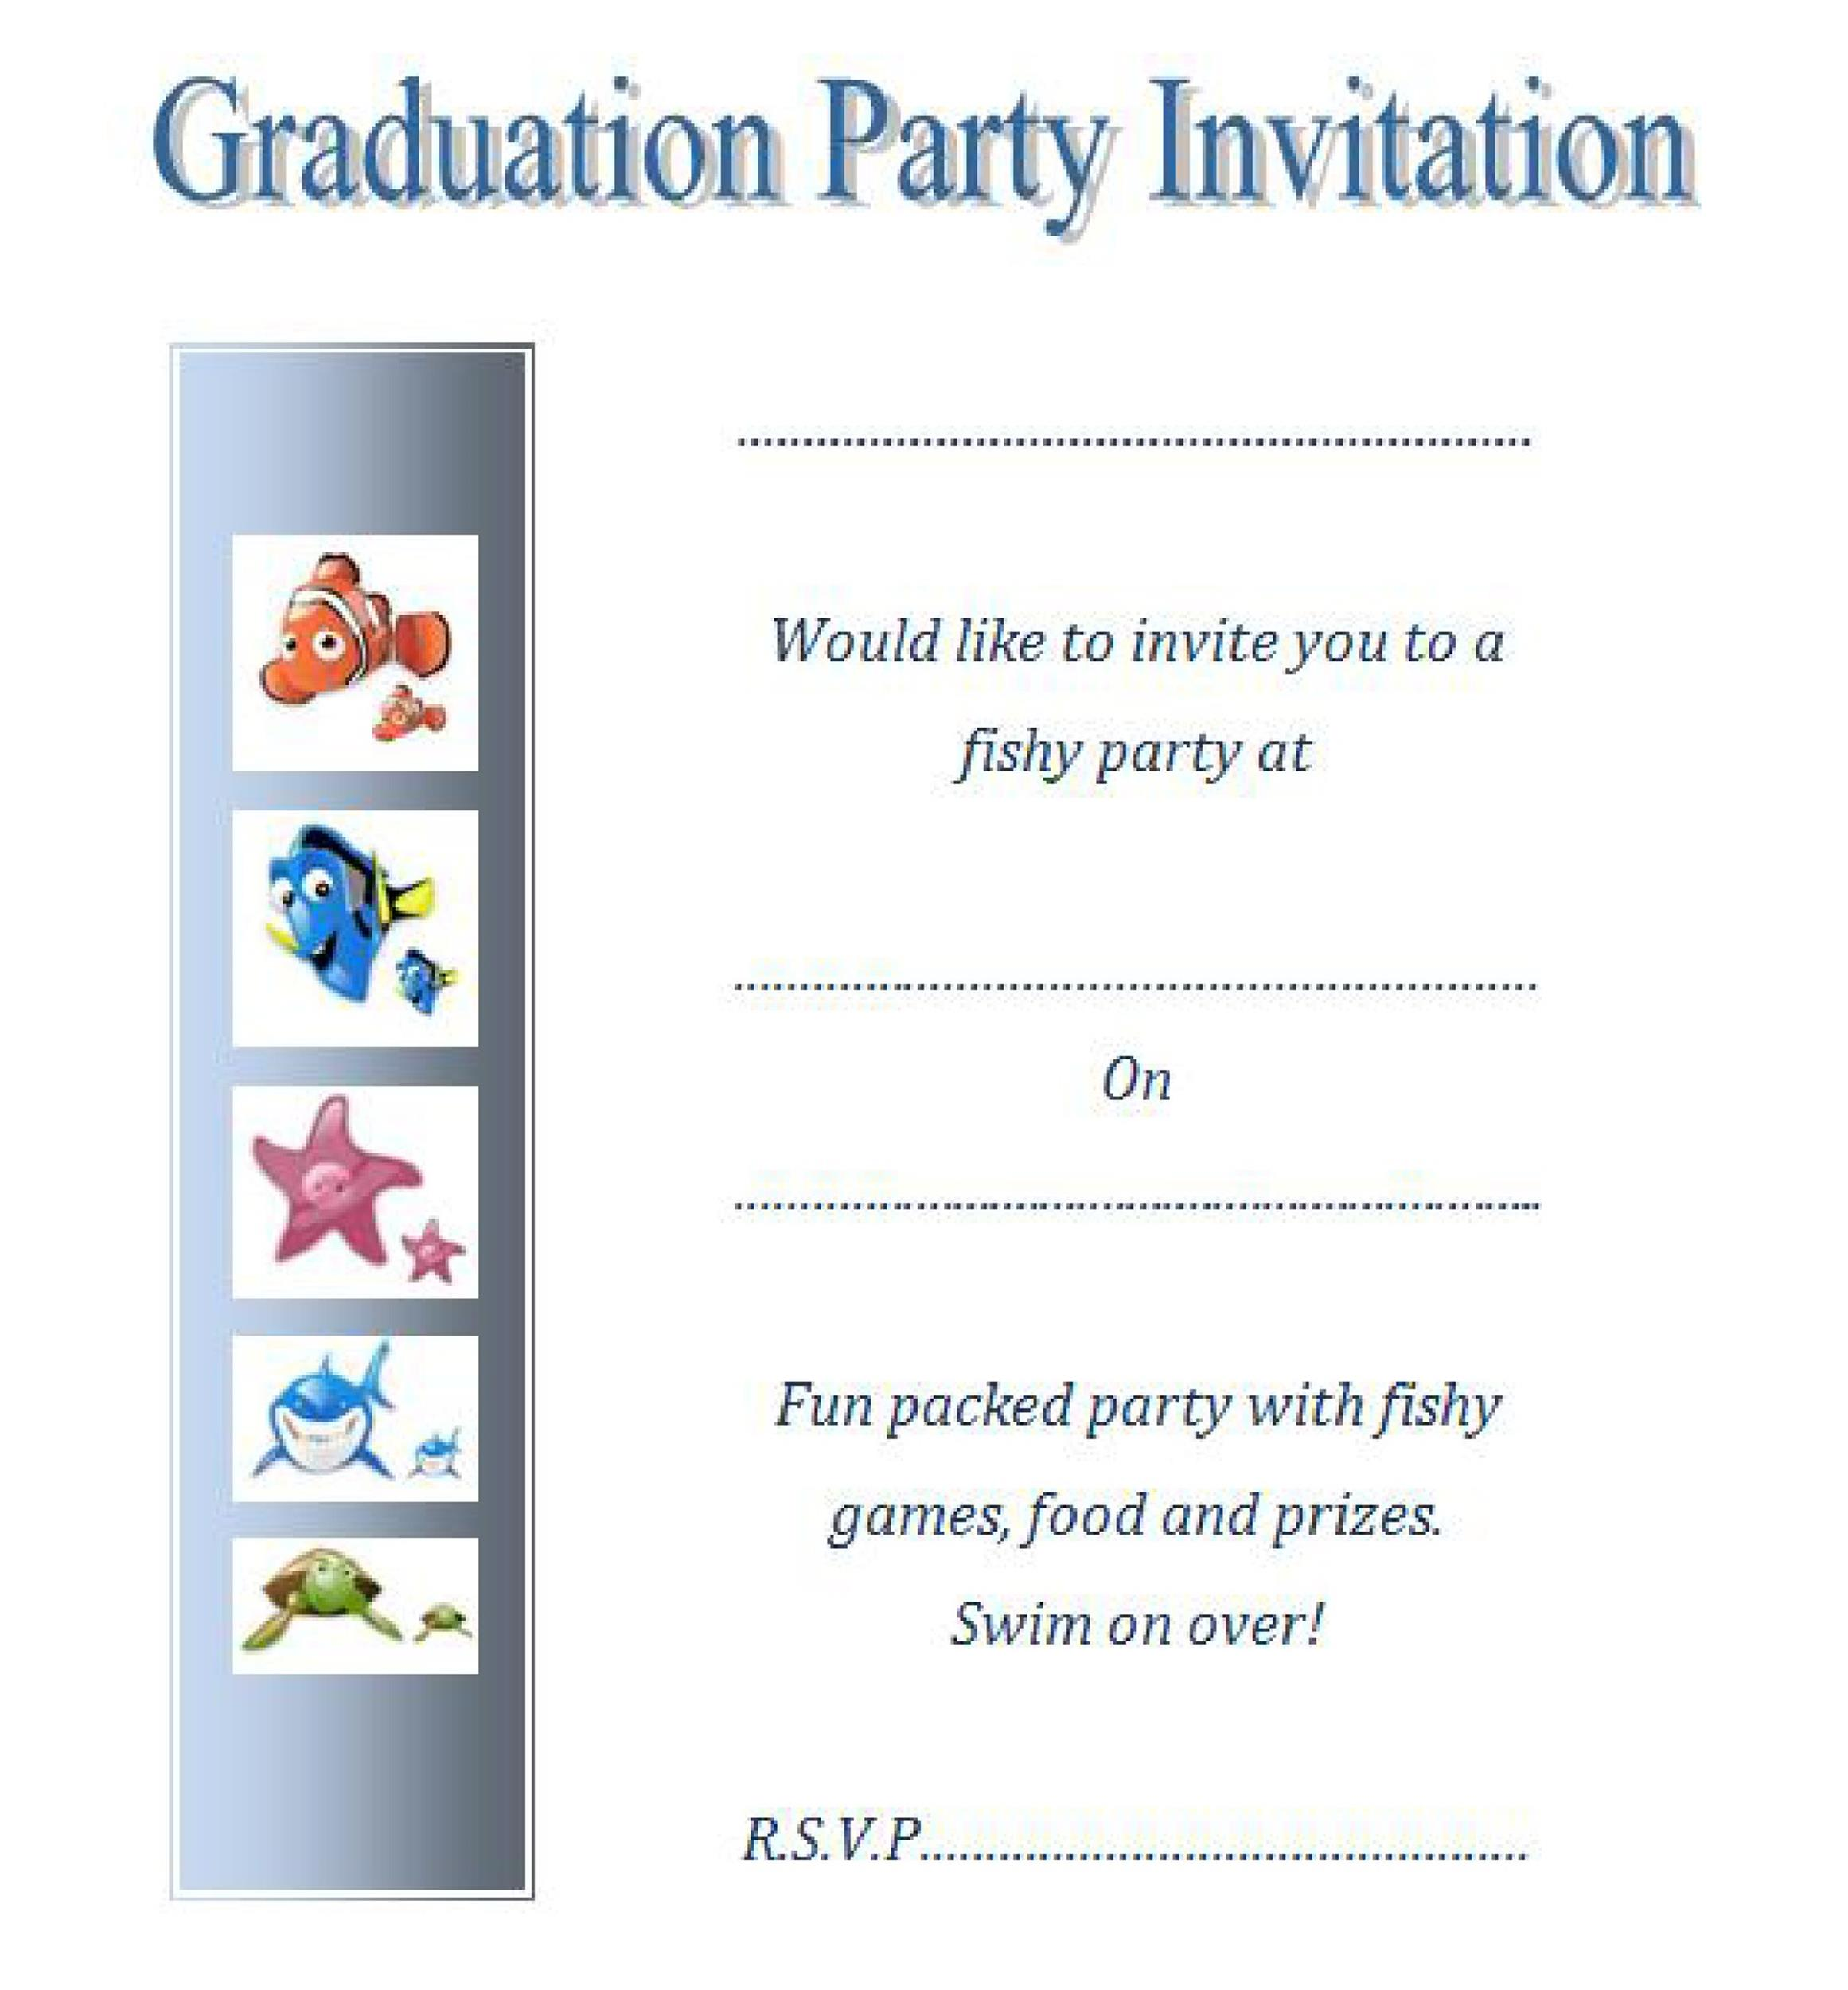 free graduation invitation templates for word igotz org